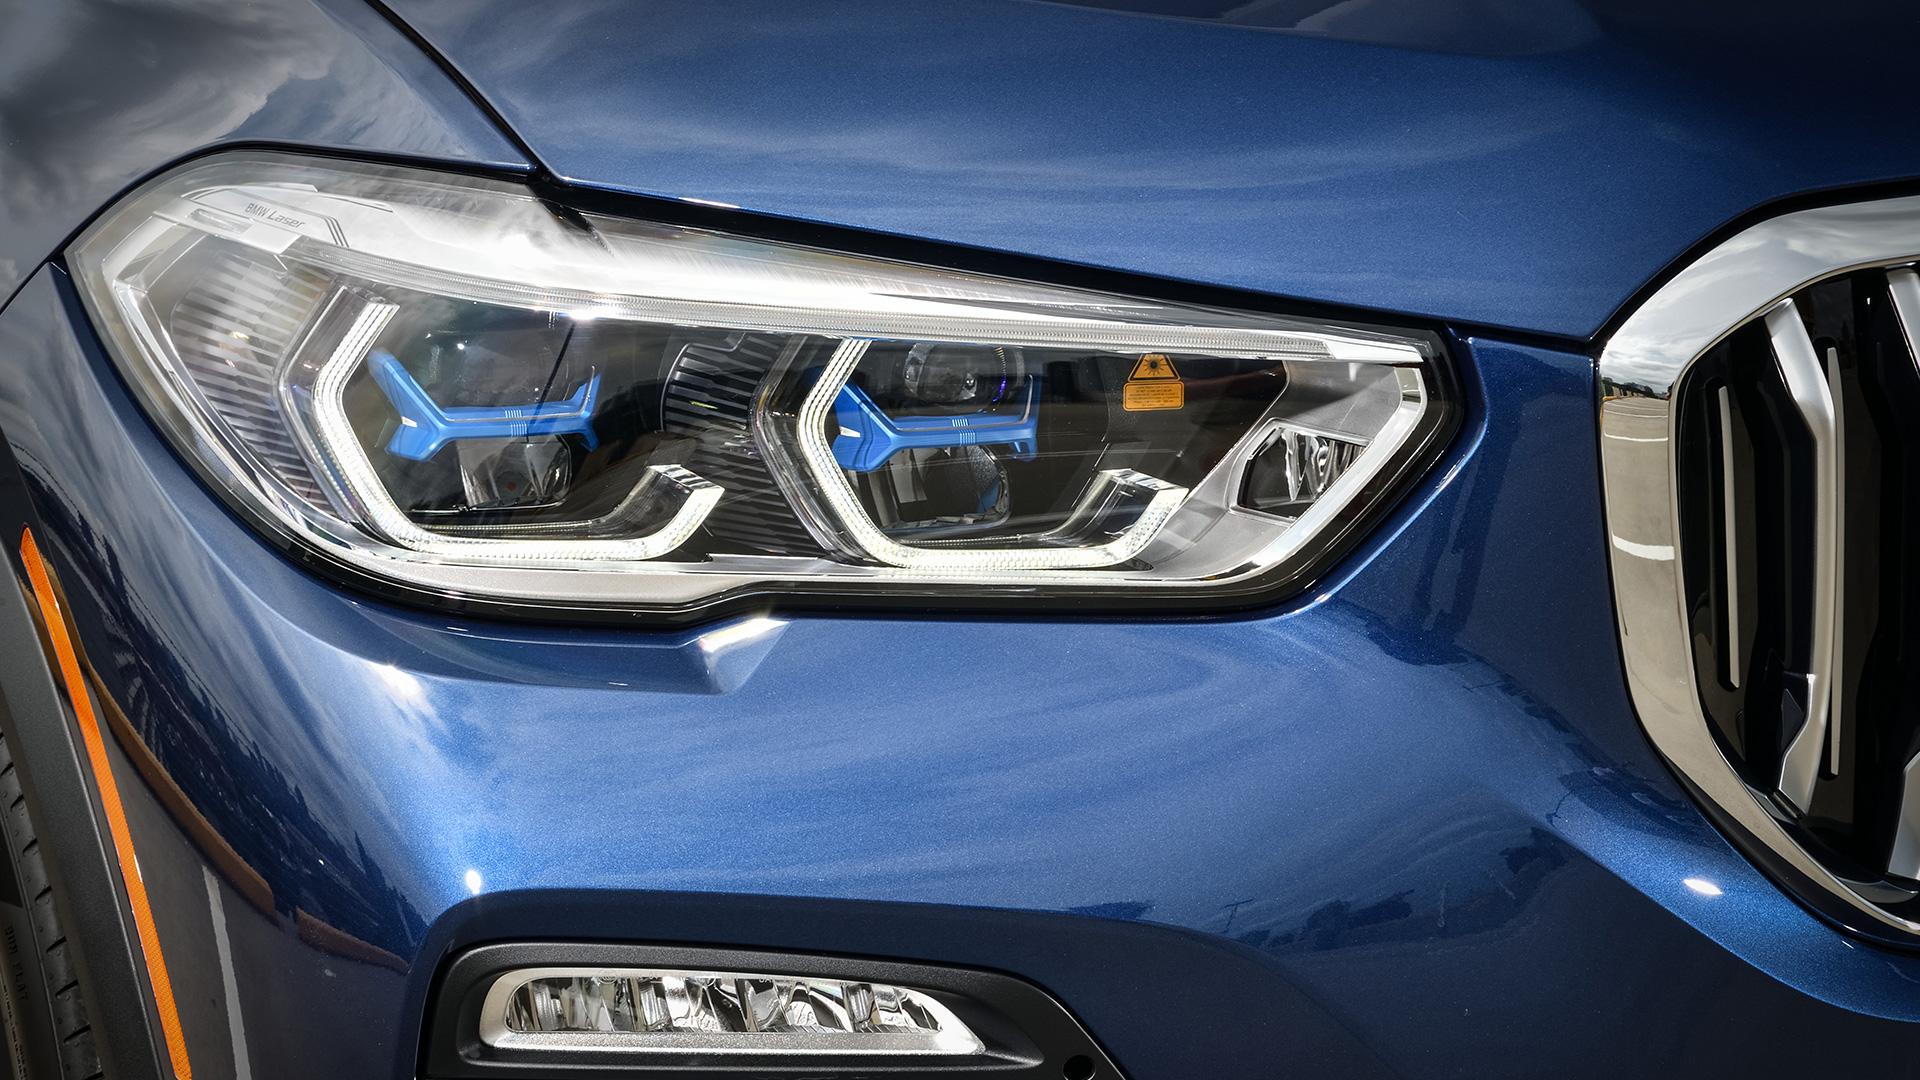 BMW X5 2020 xDrive 30d xLine Exterior